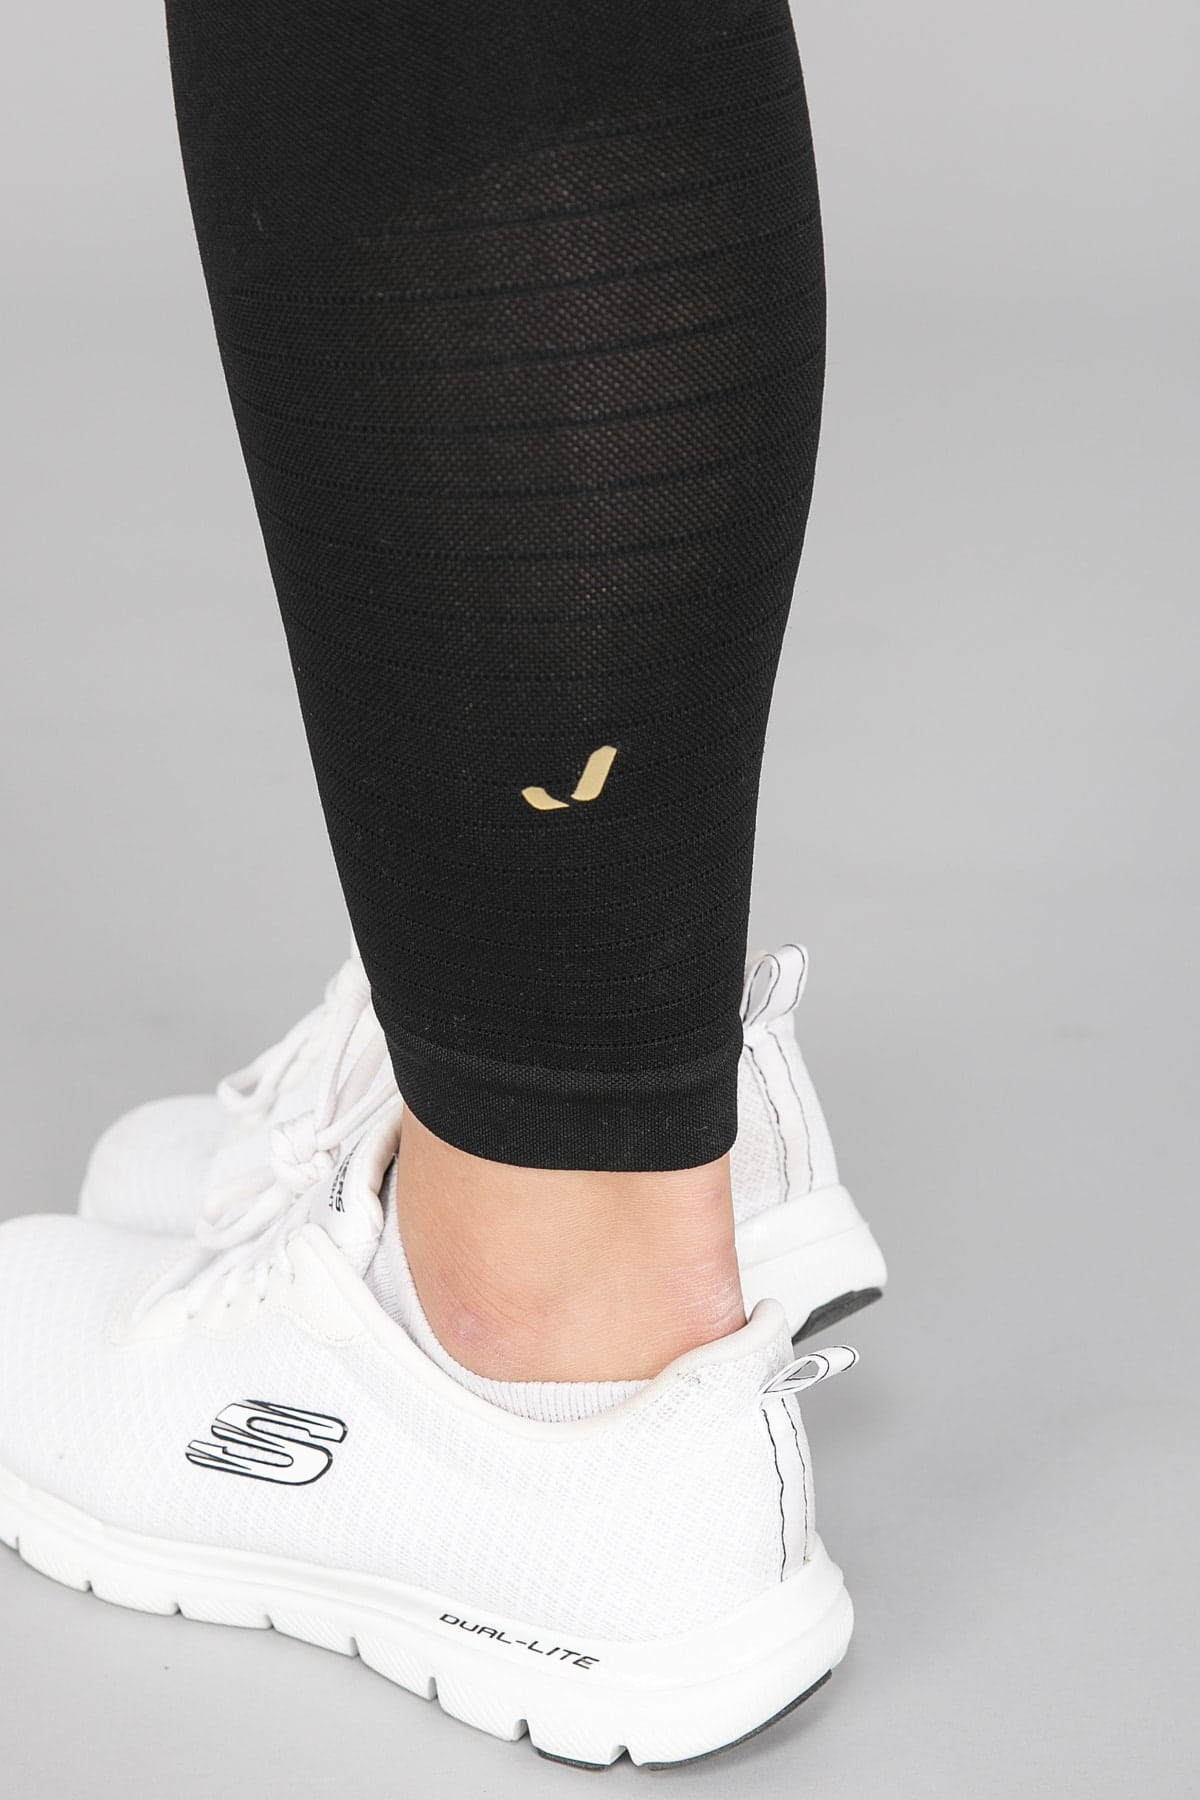 Jerf Gela 2.0 tights Black23